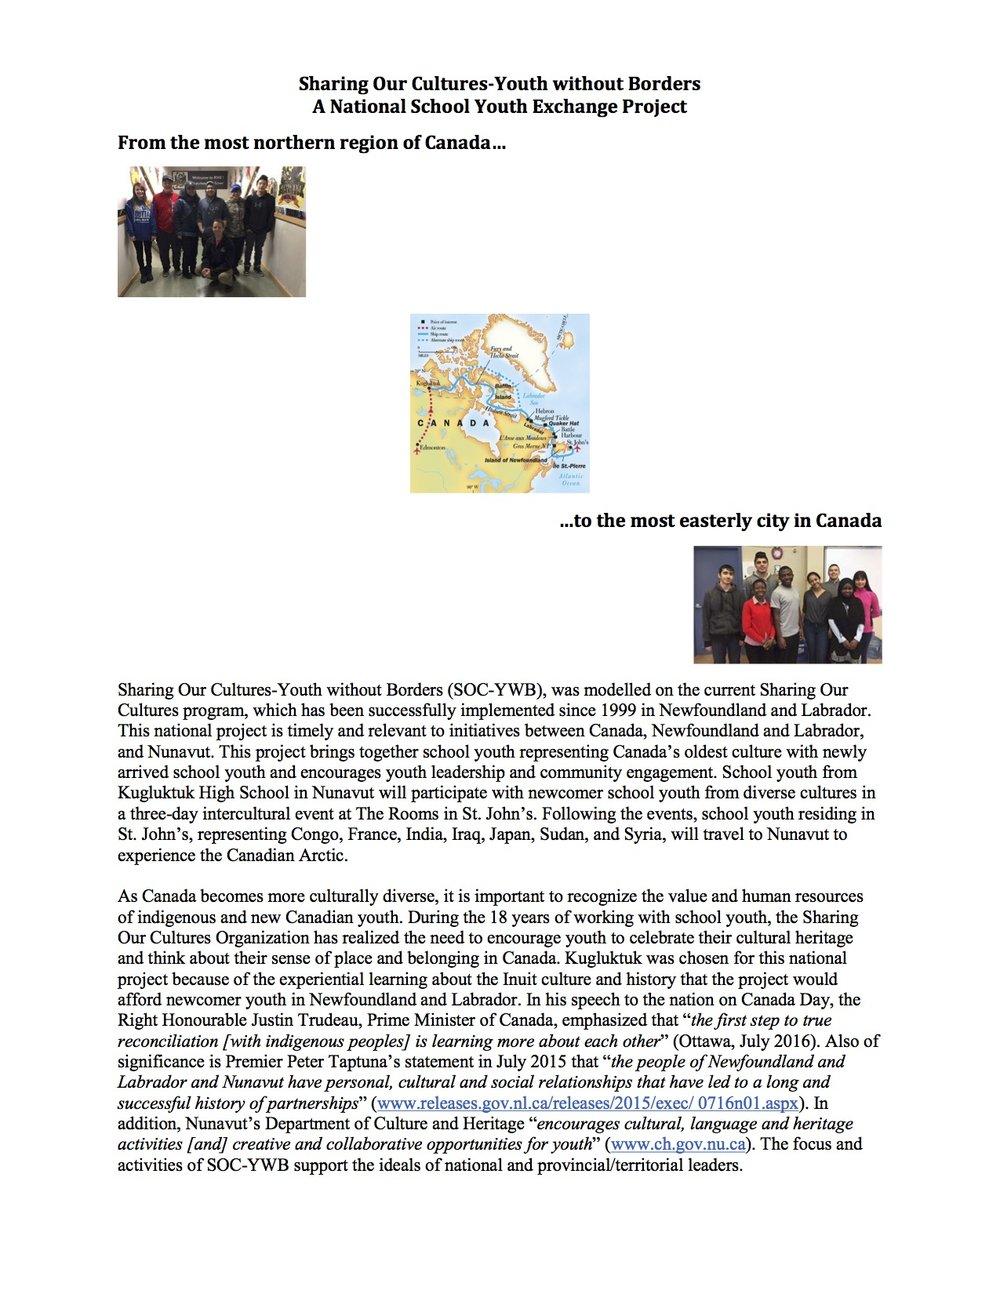 SOC-YWB Nunavut National Project page 2.jpg